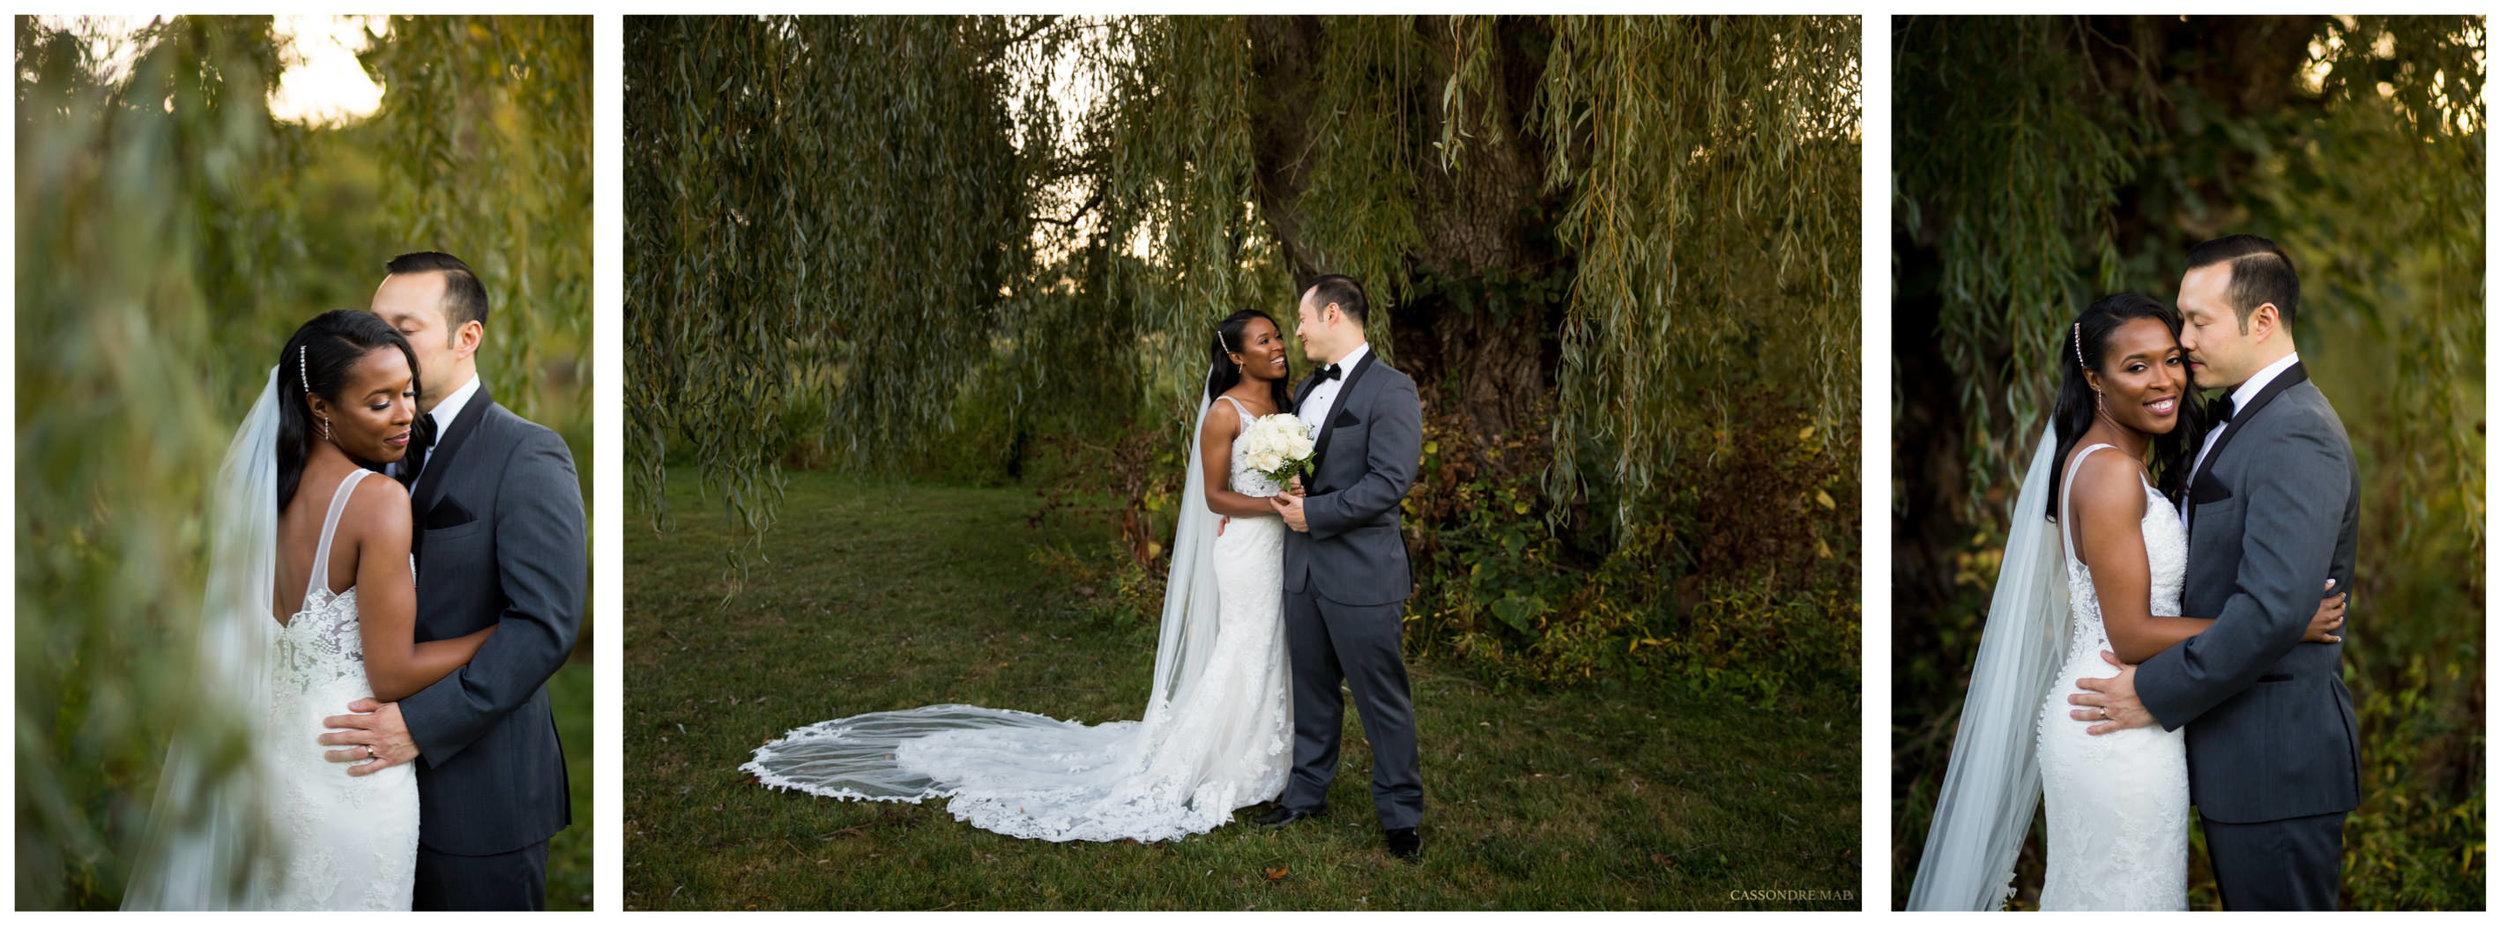 West Hills Country Club Wedding Photos Cassondre Mae Photography 15.jpg